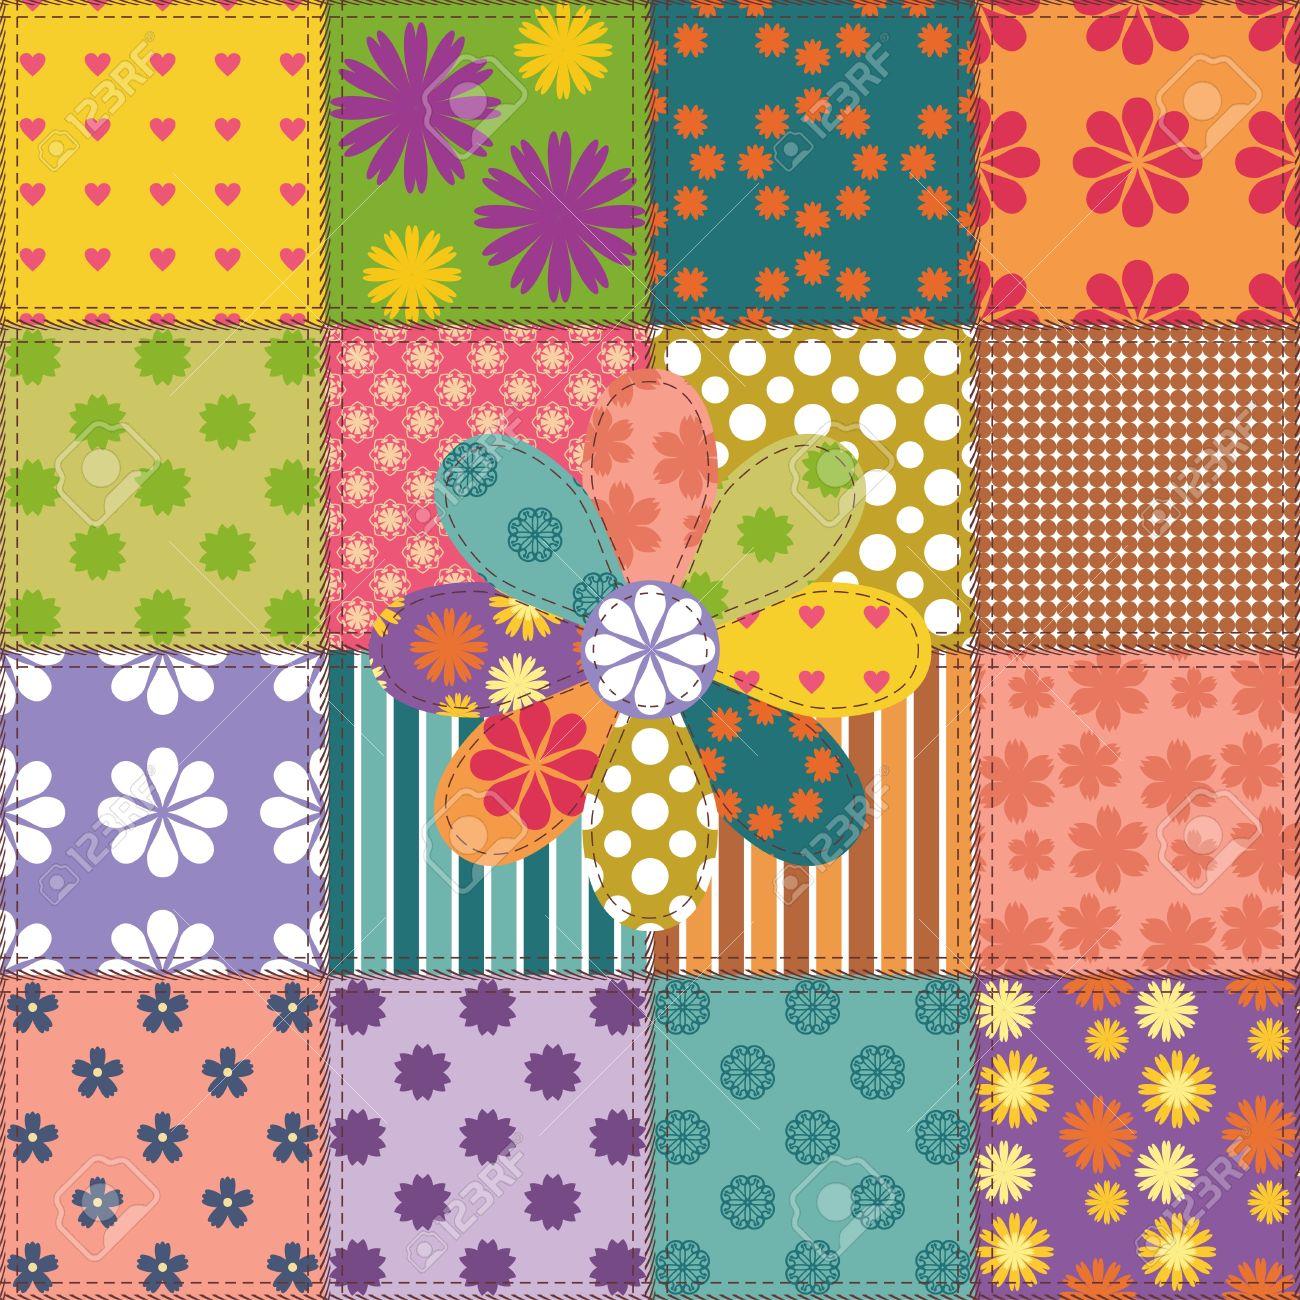 Resultado de imagen para different patterns in art